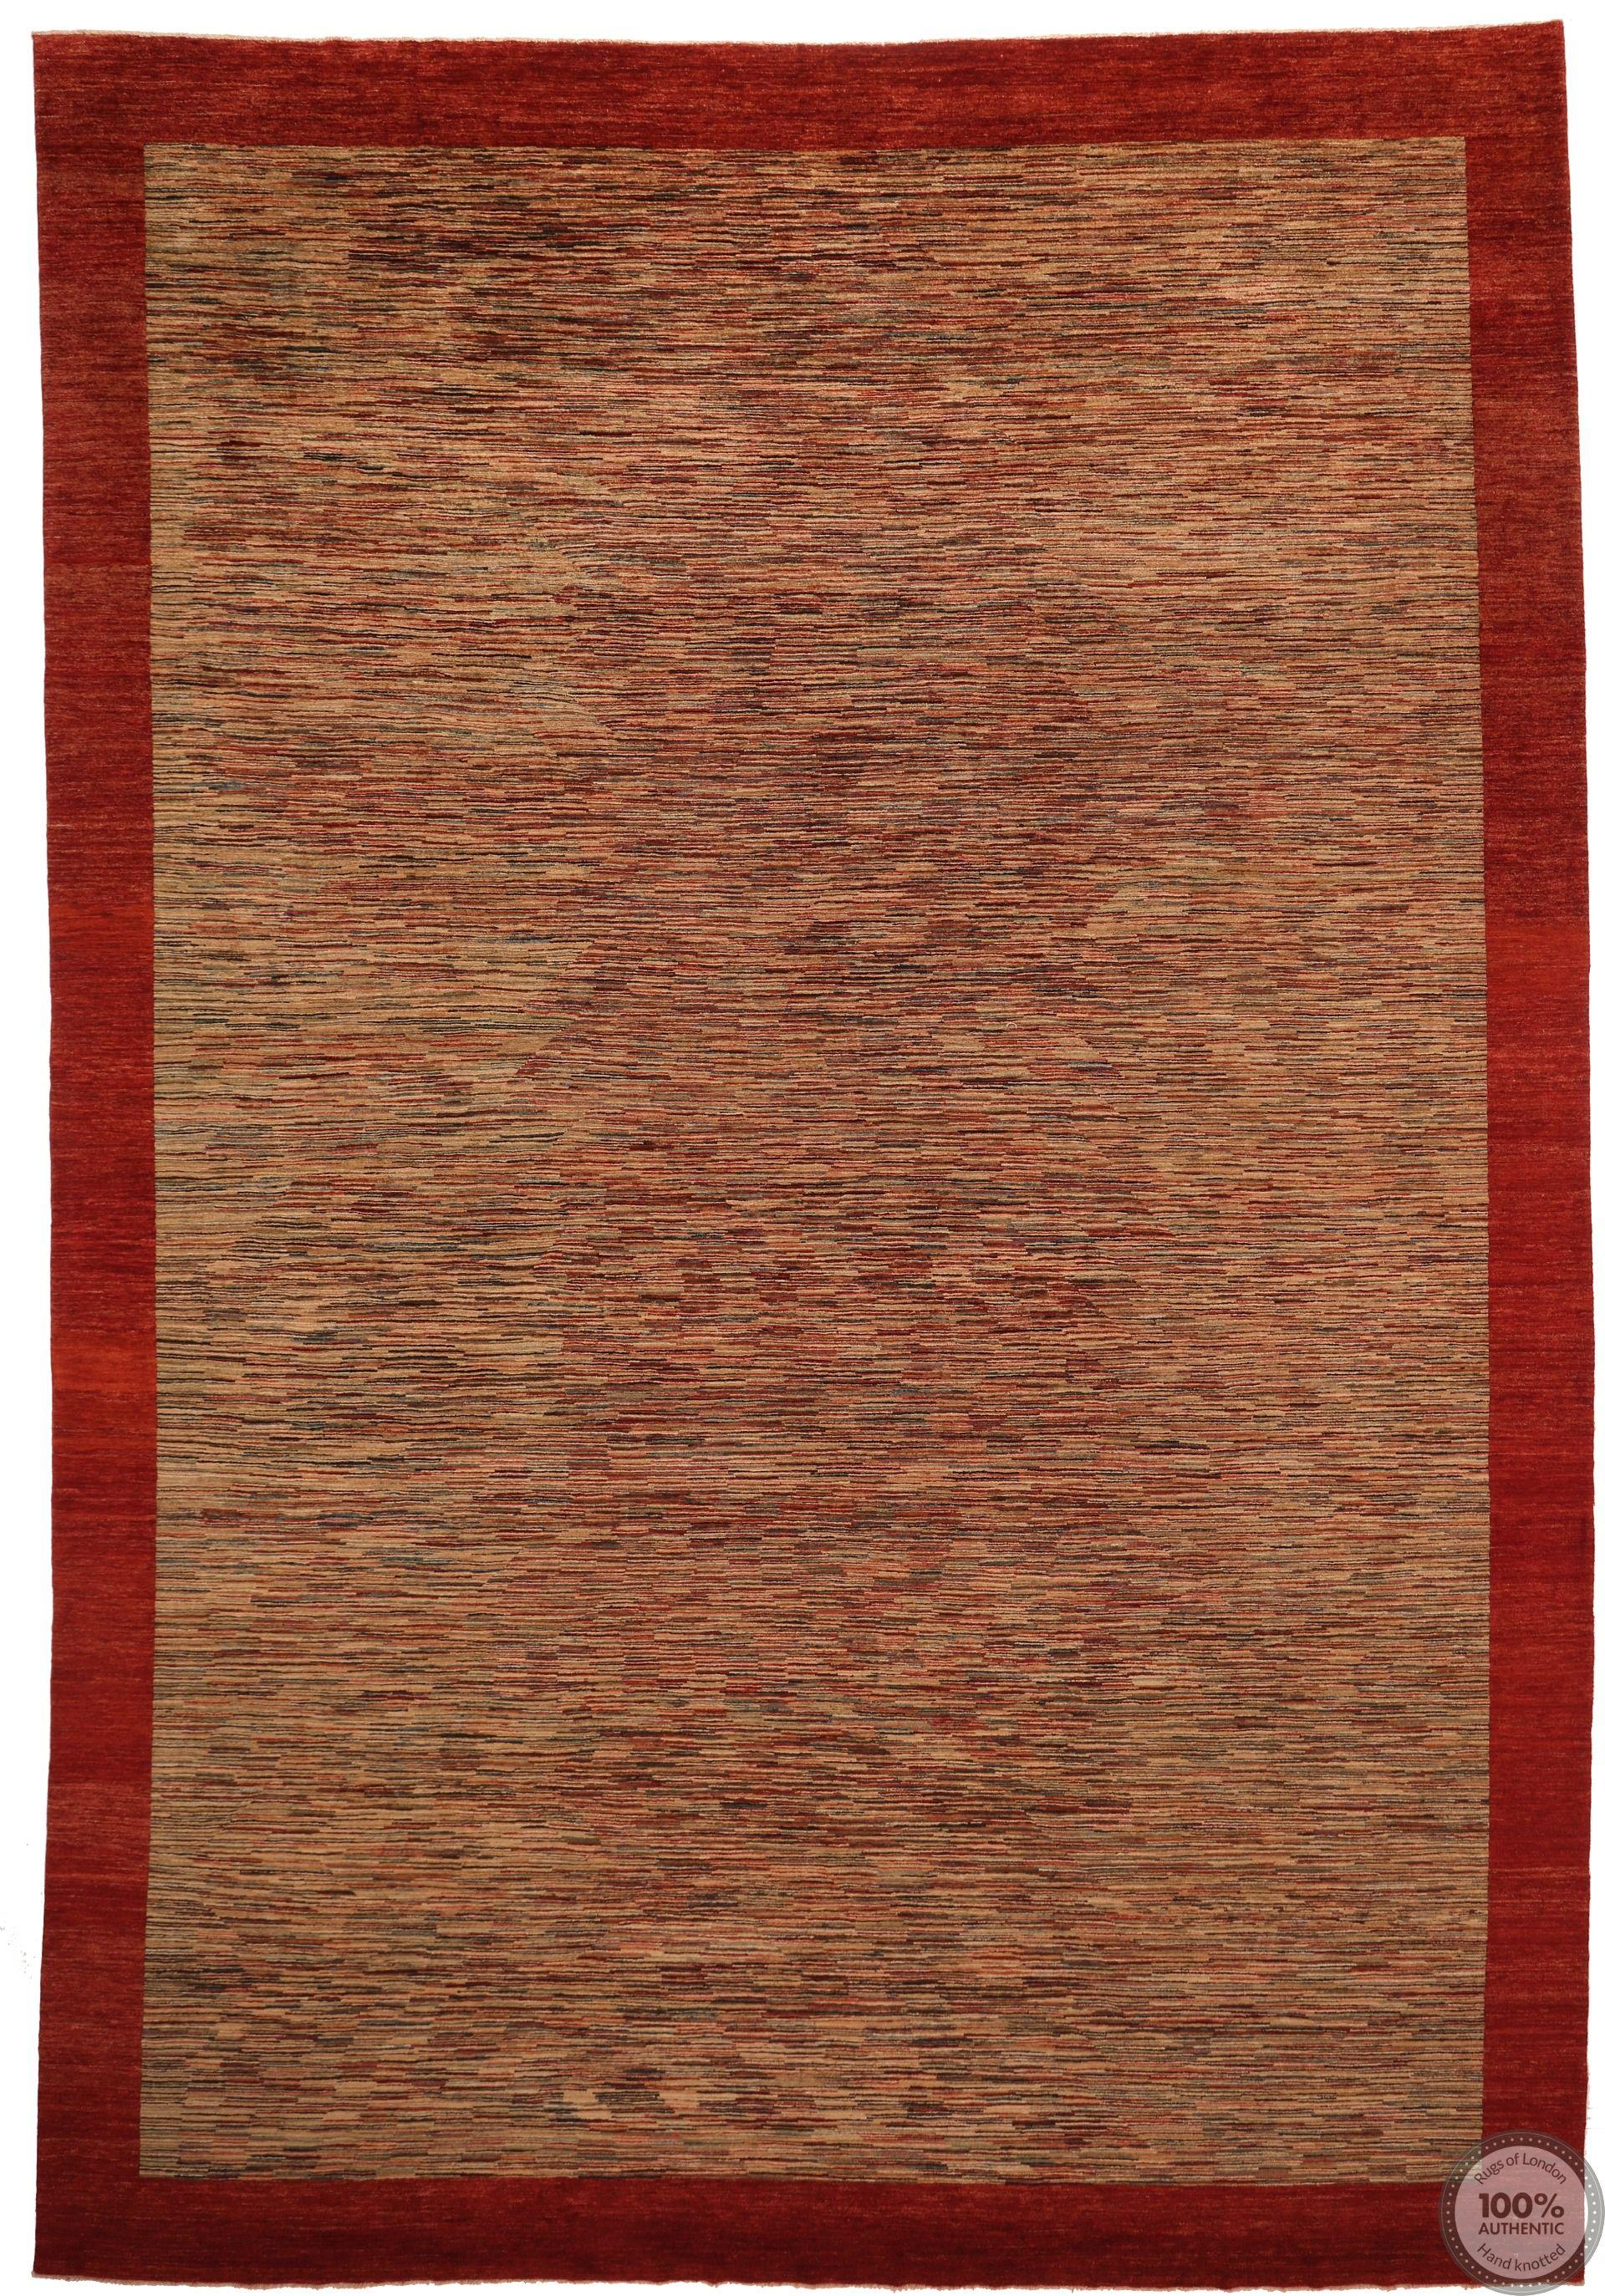 Garous / Ziegler Modern Design Rug 16'86 x 11'55